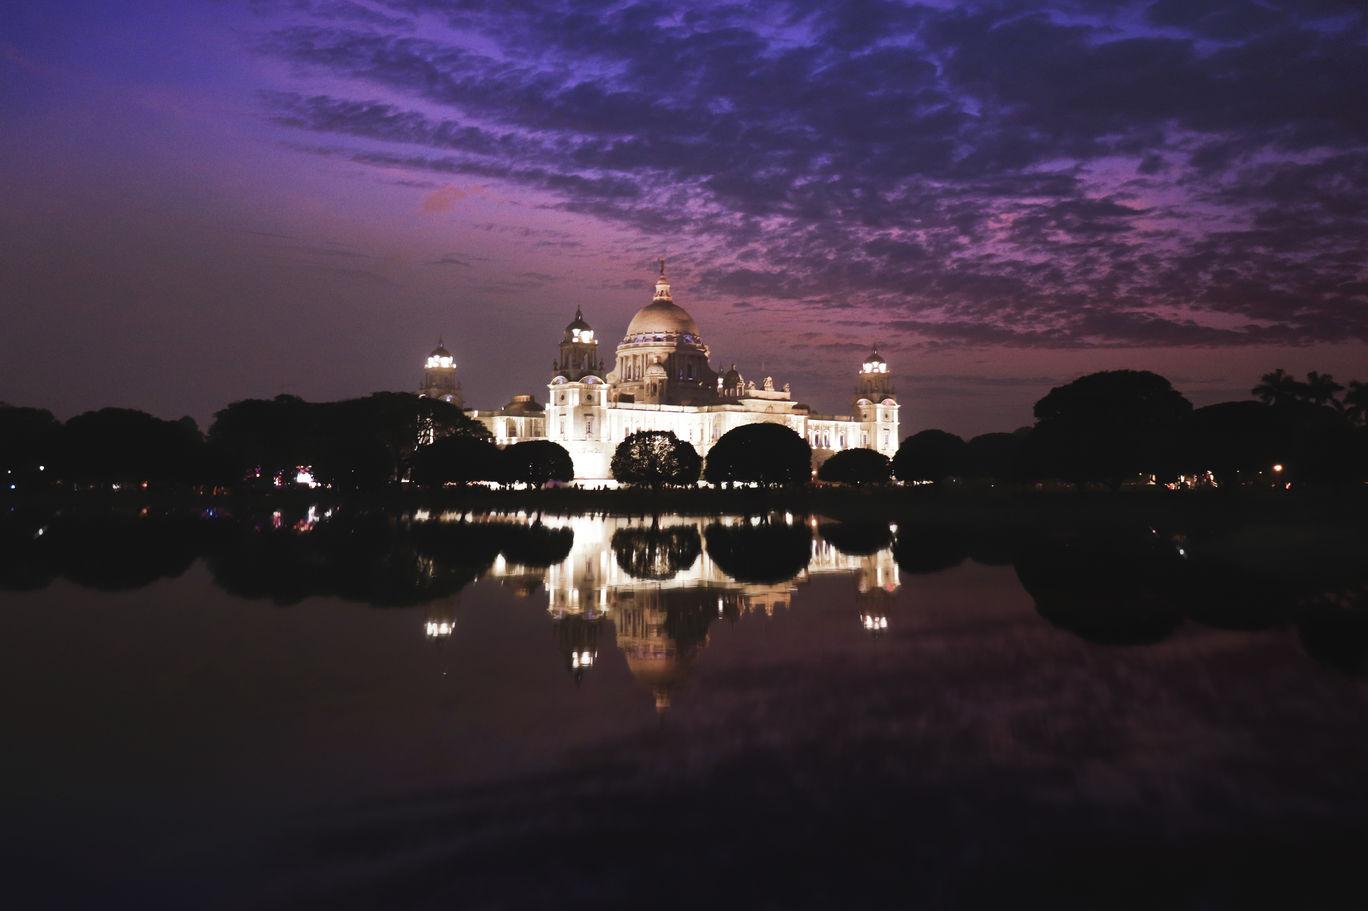 Photo of Victoria Memorial By Shankhadeep Das